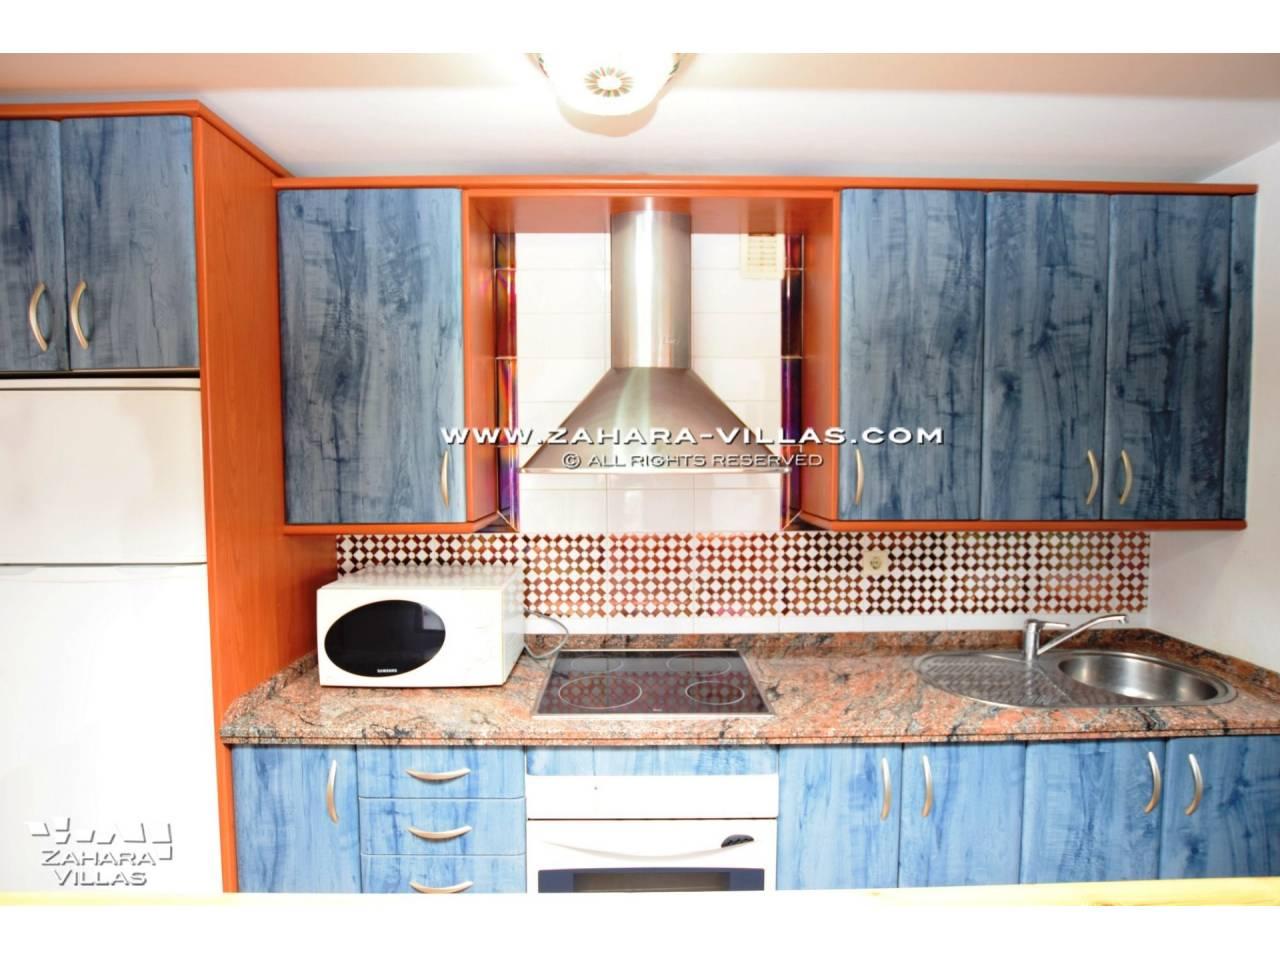 Imagen 9 de Penthouse for sale in Zahara de los Atunes